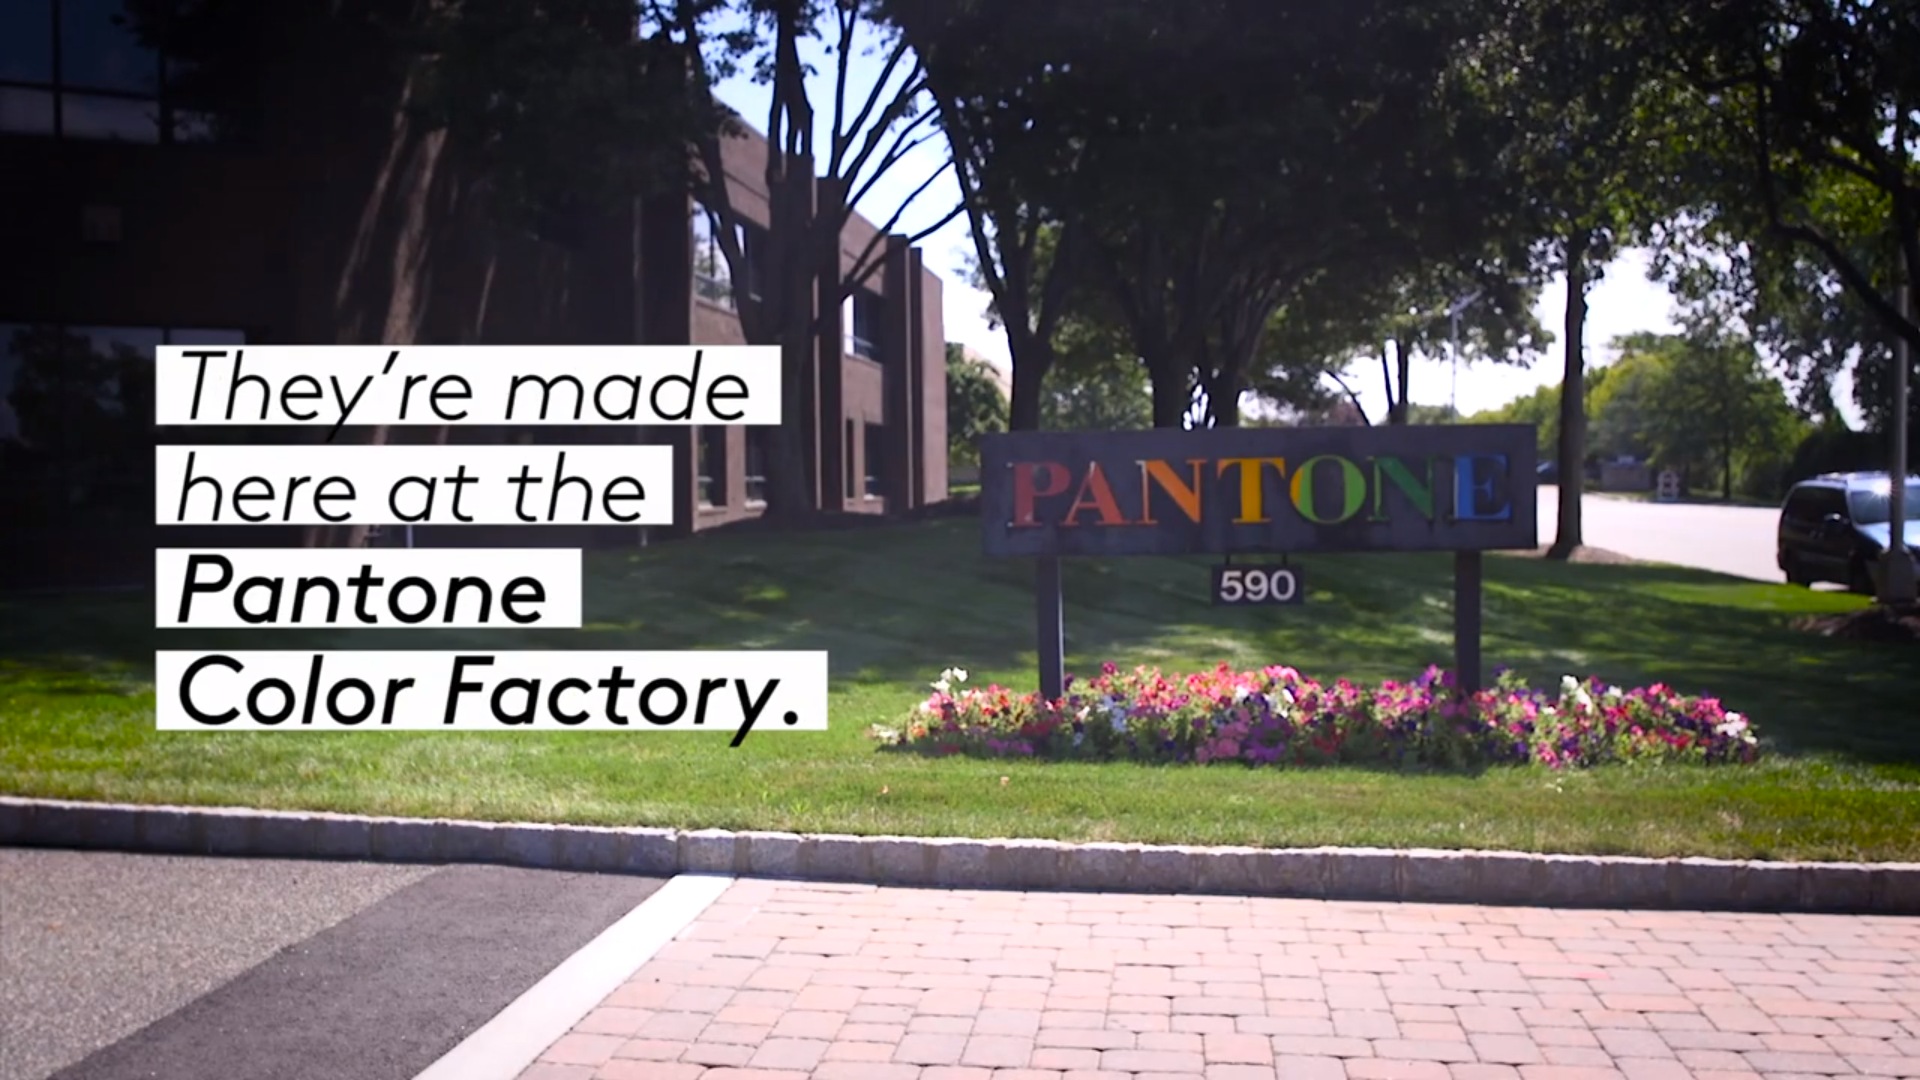 Inside-Pantone-Color-Factory-Carlstadt-NJ